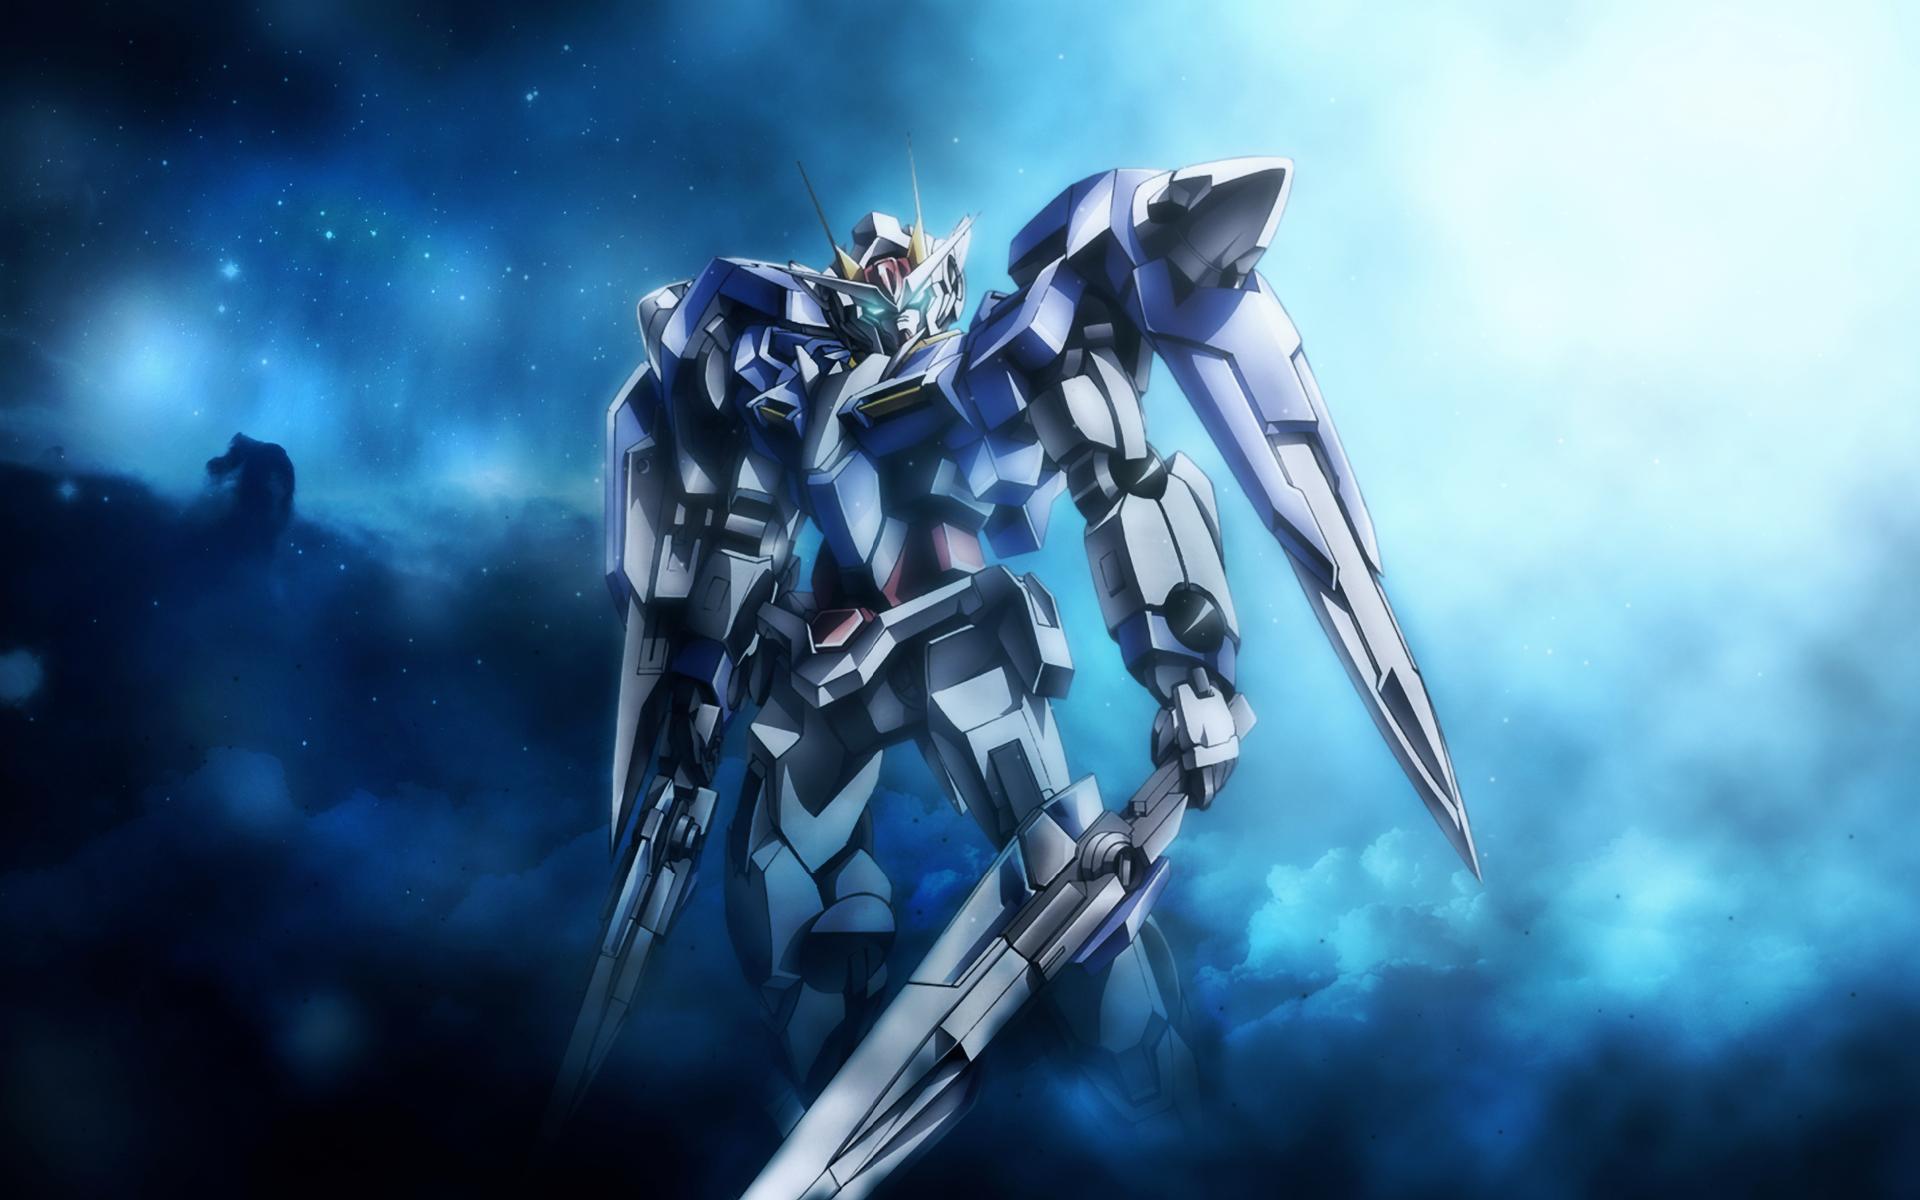 Gundam HD Wallpapers 1920x1200